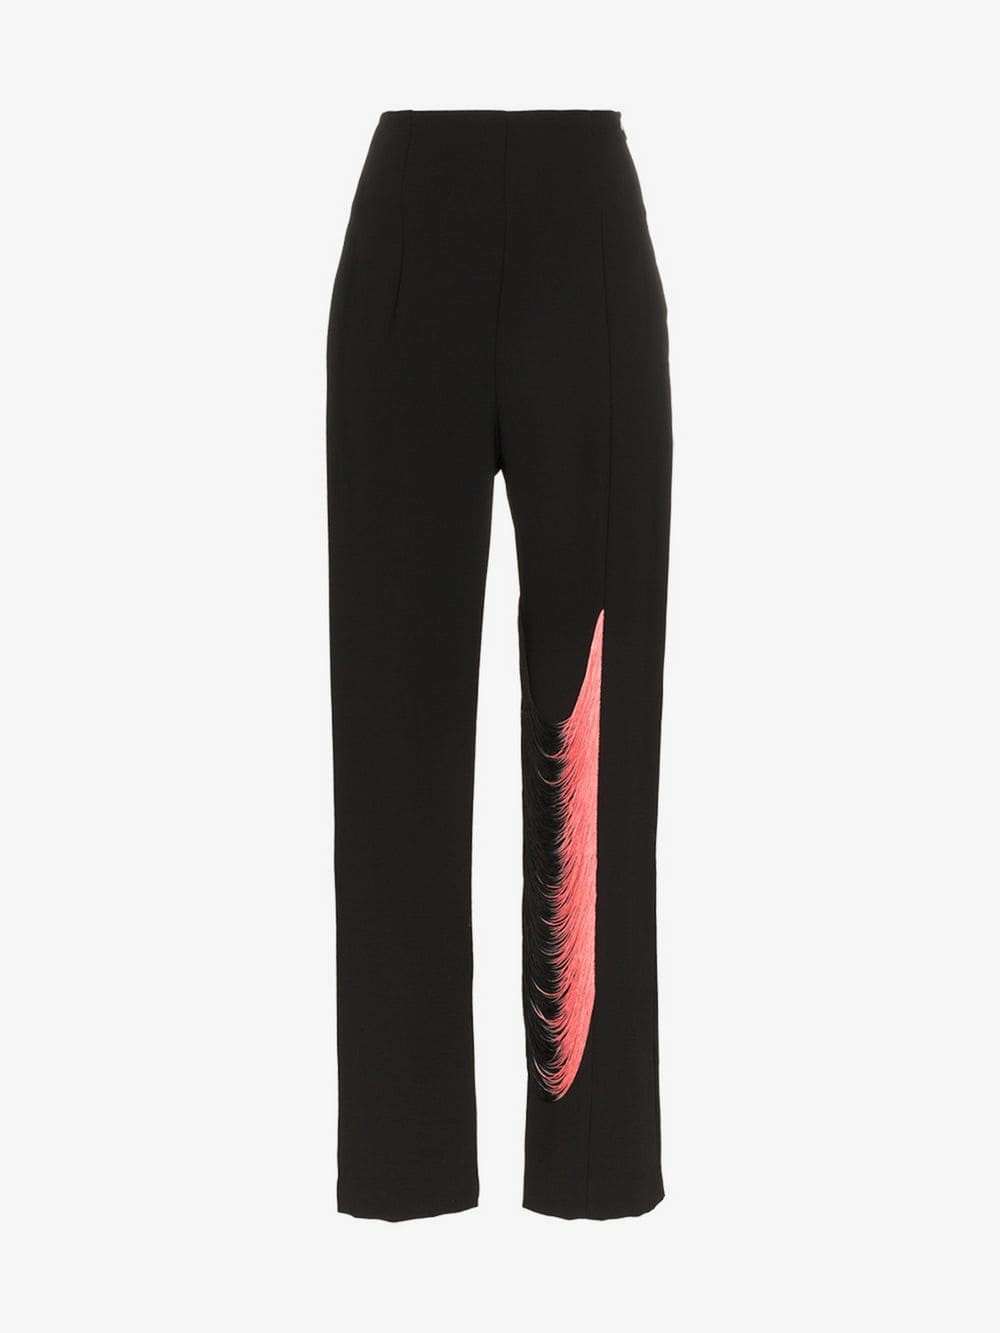 George Keburia high-waisted fringe detail trousers in black